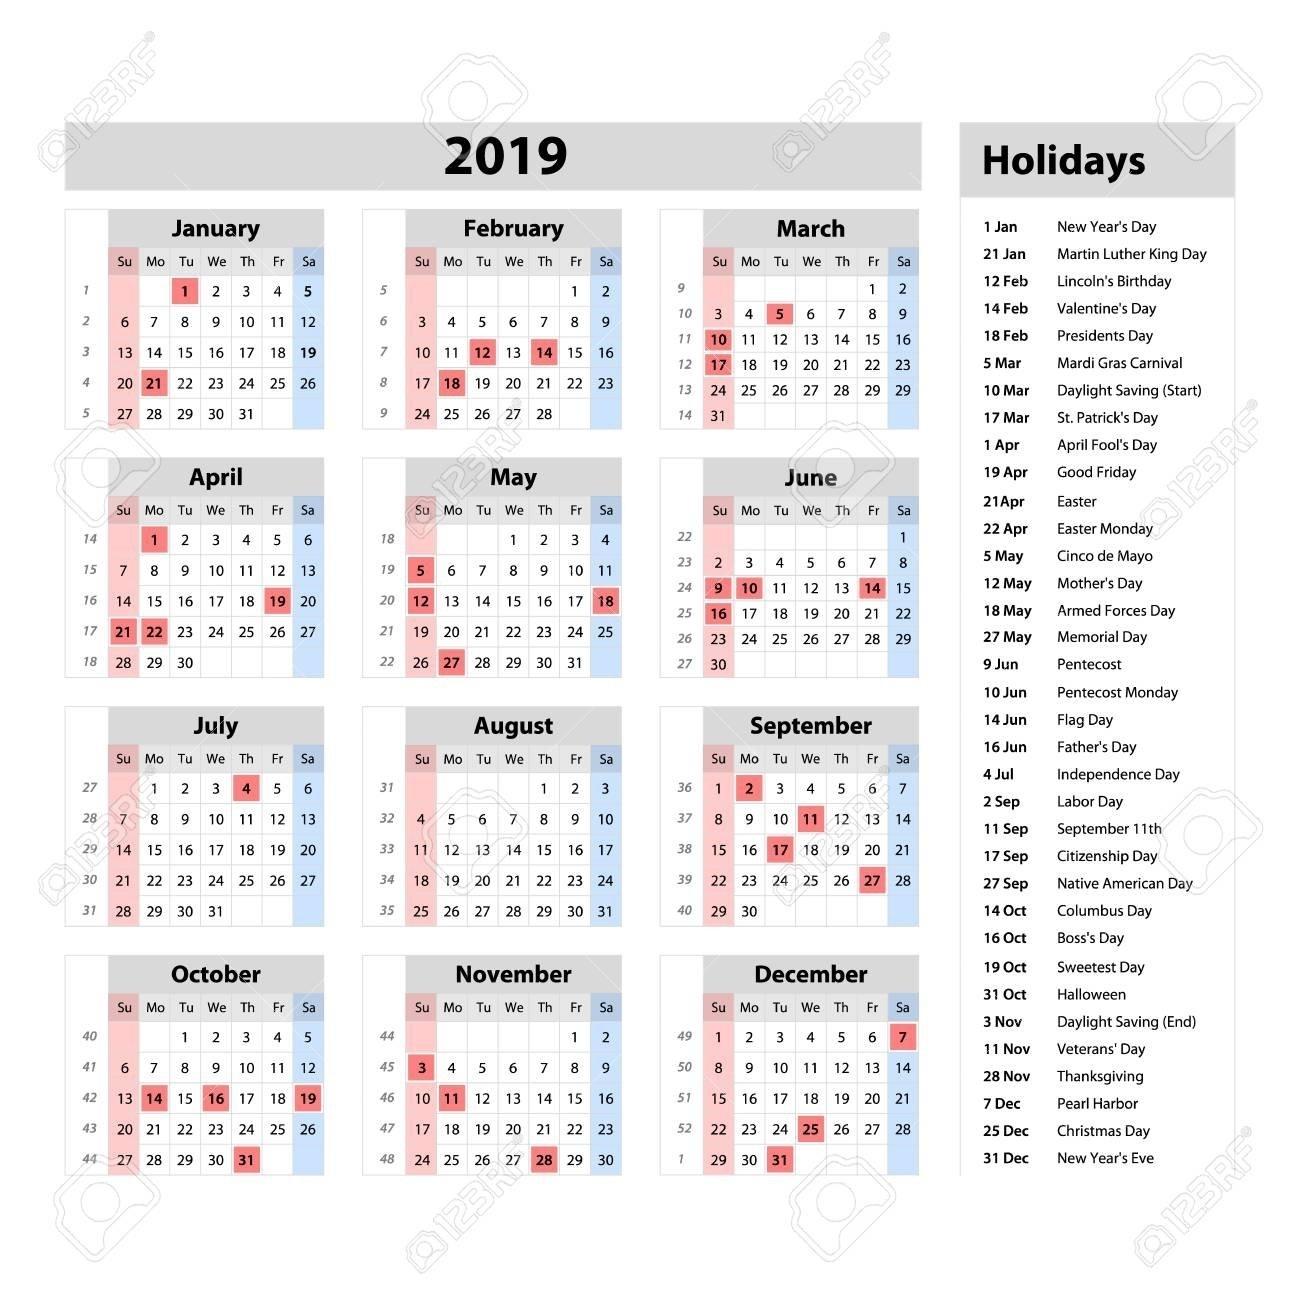 At A Glance Calendar 2019 :-Free Calendar Template